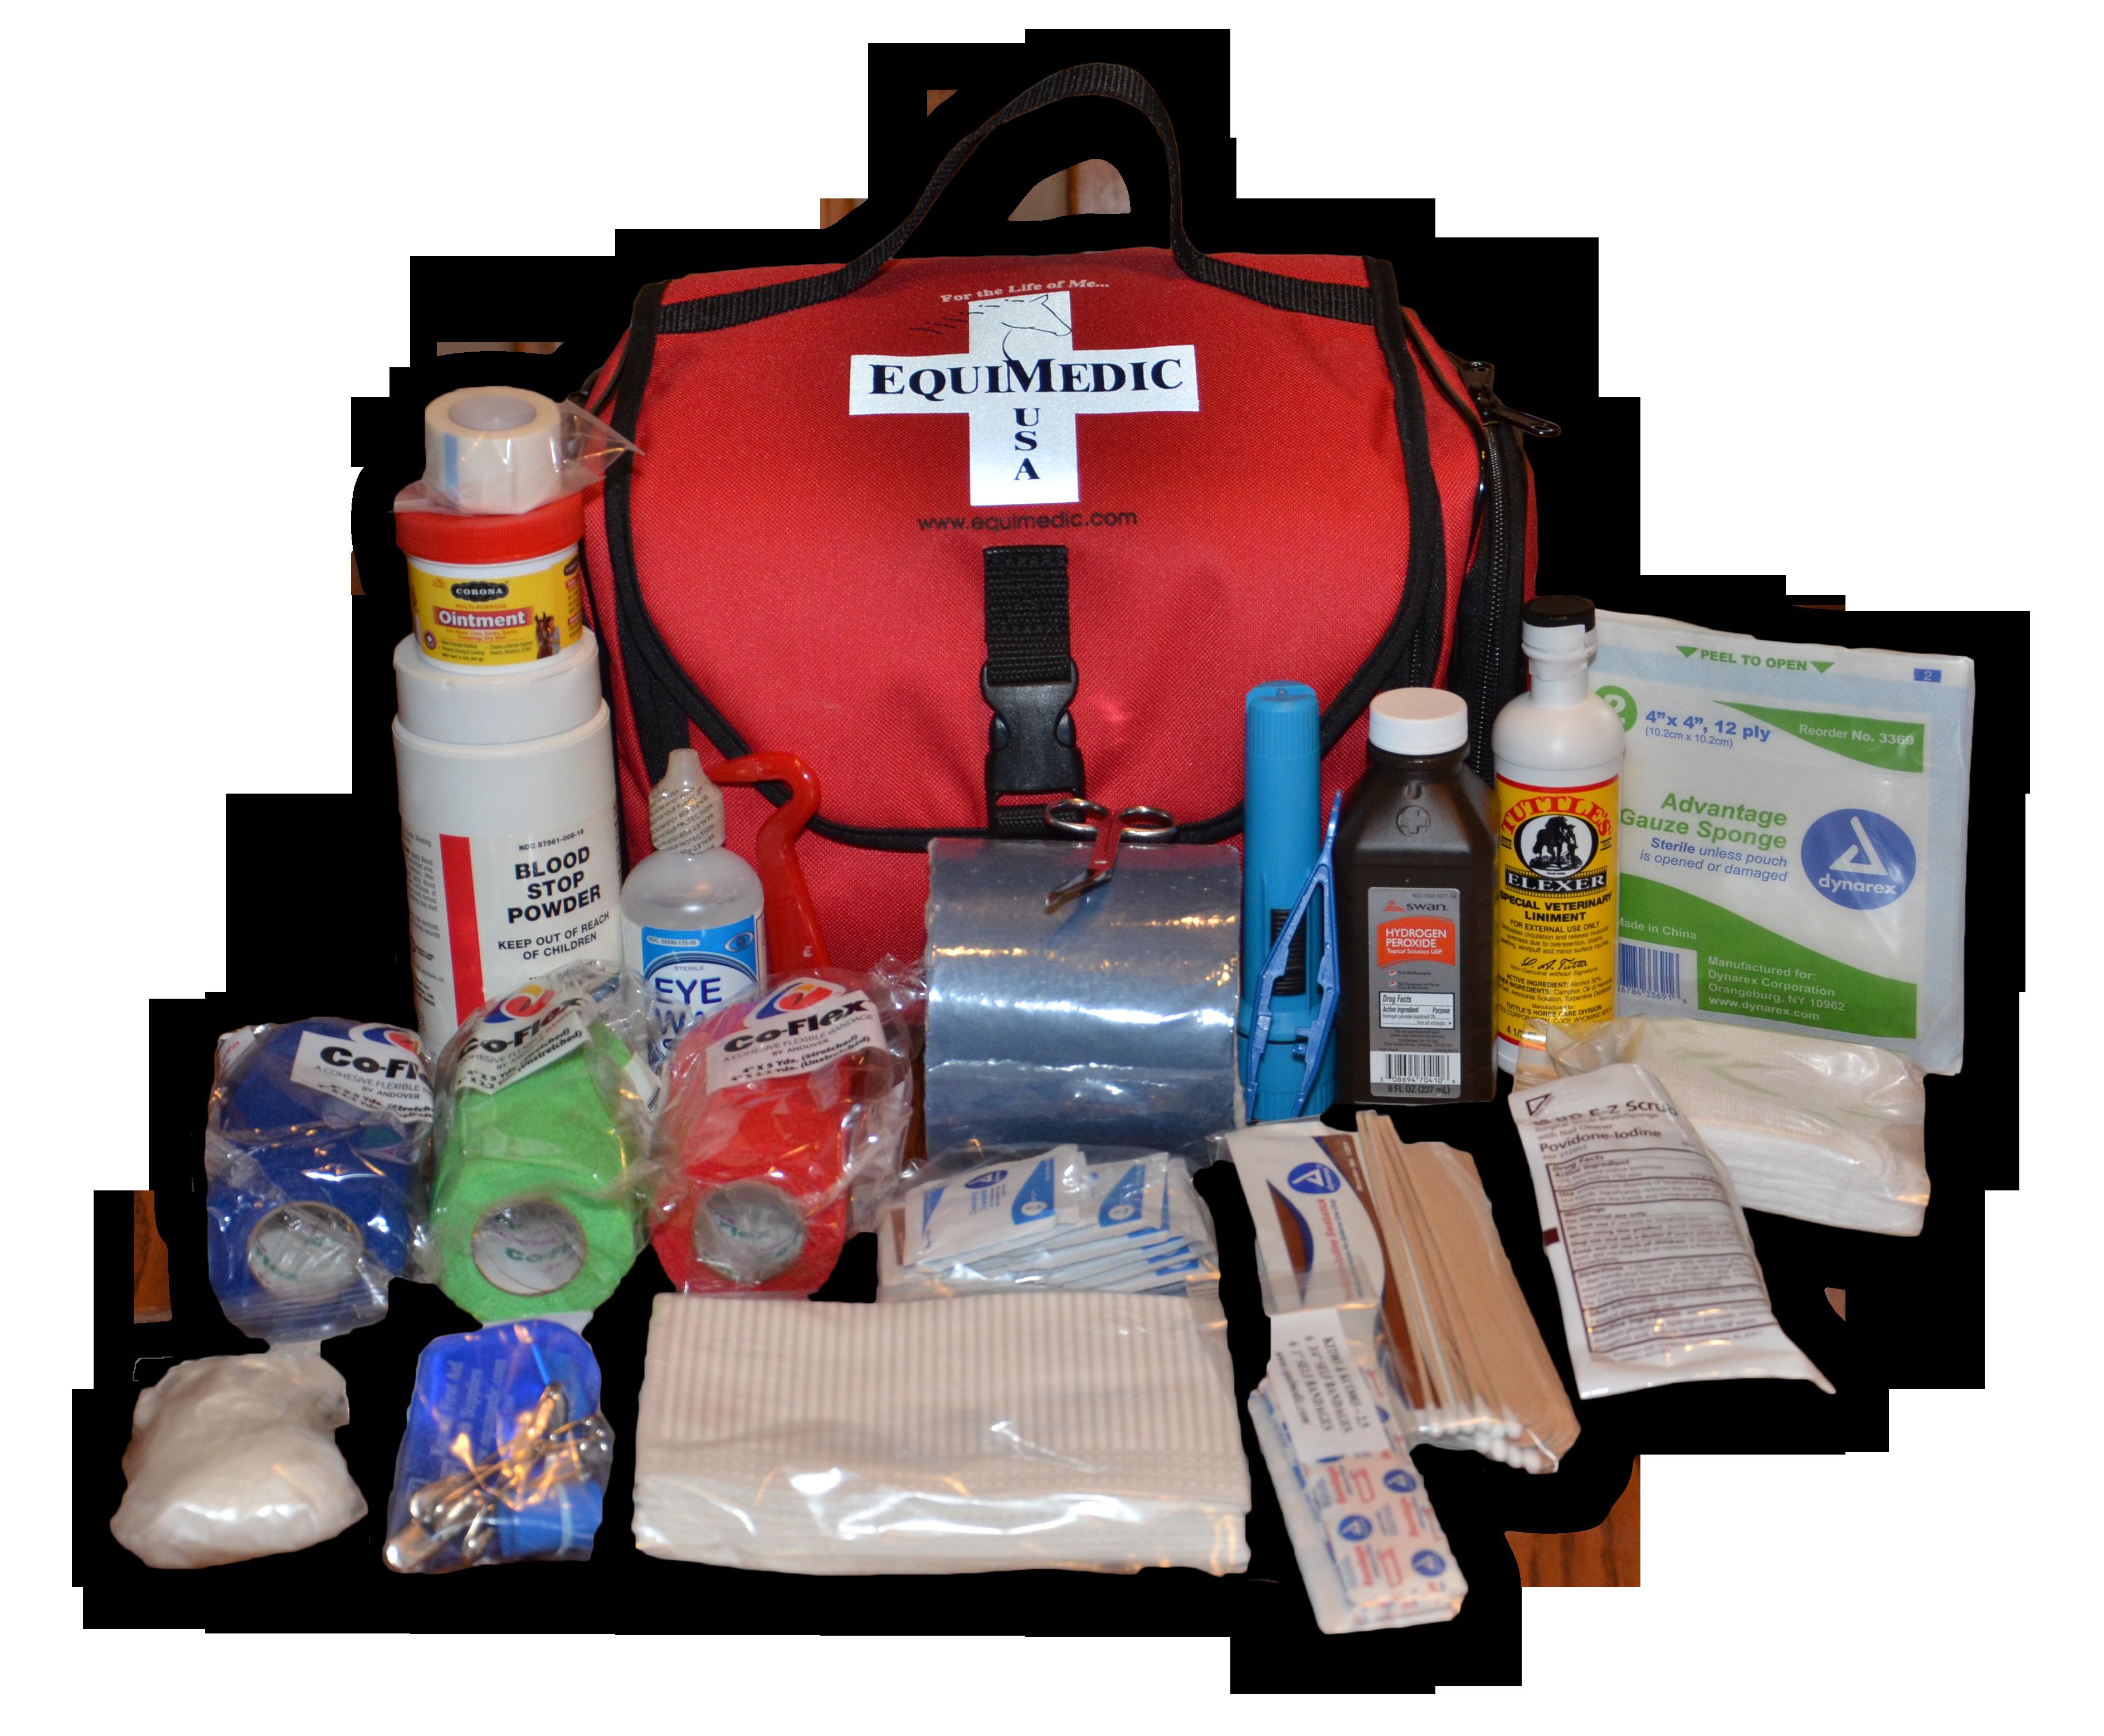 Emergency png transparent images. Earthquake clipart survival kit